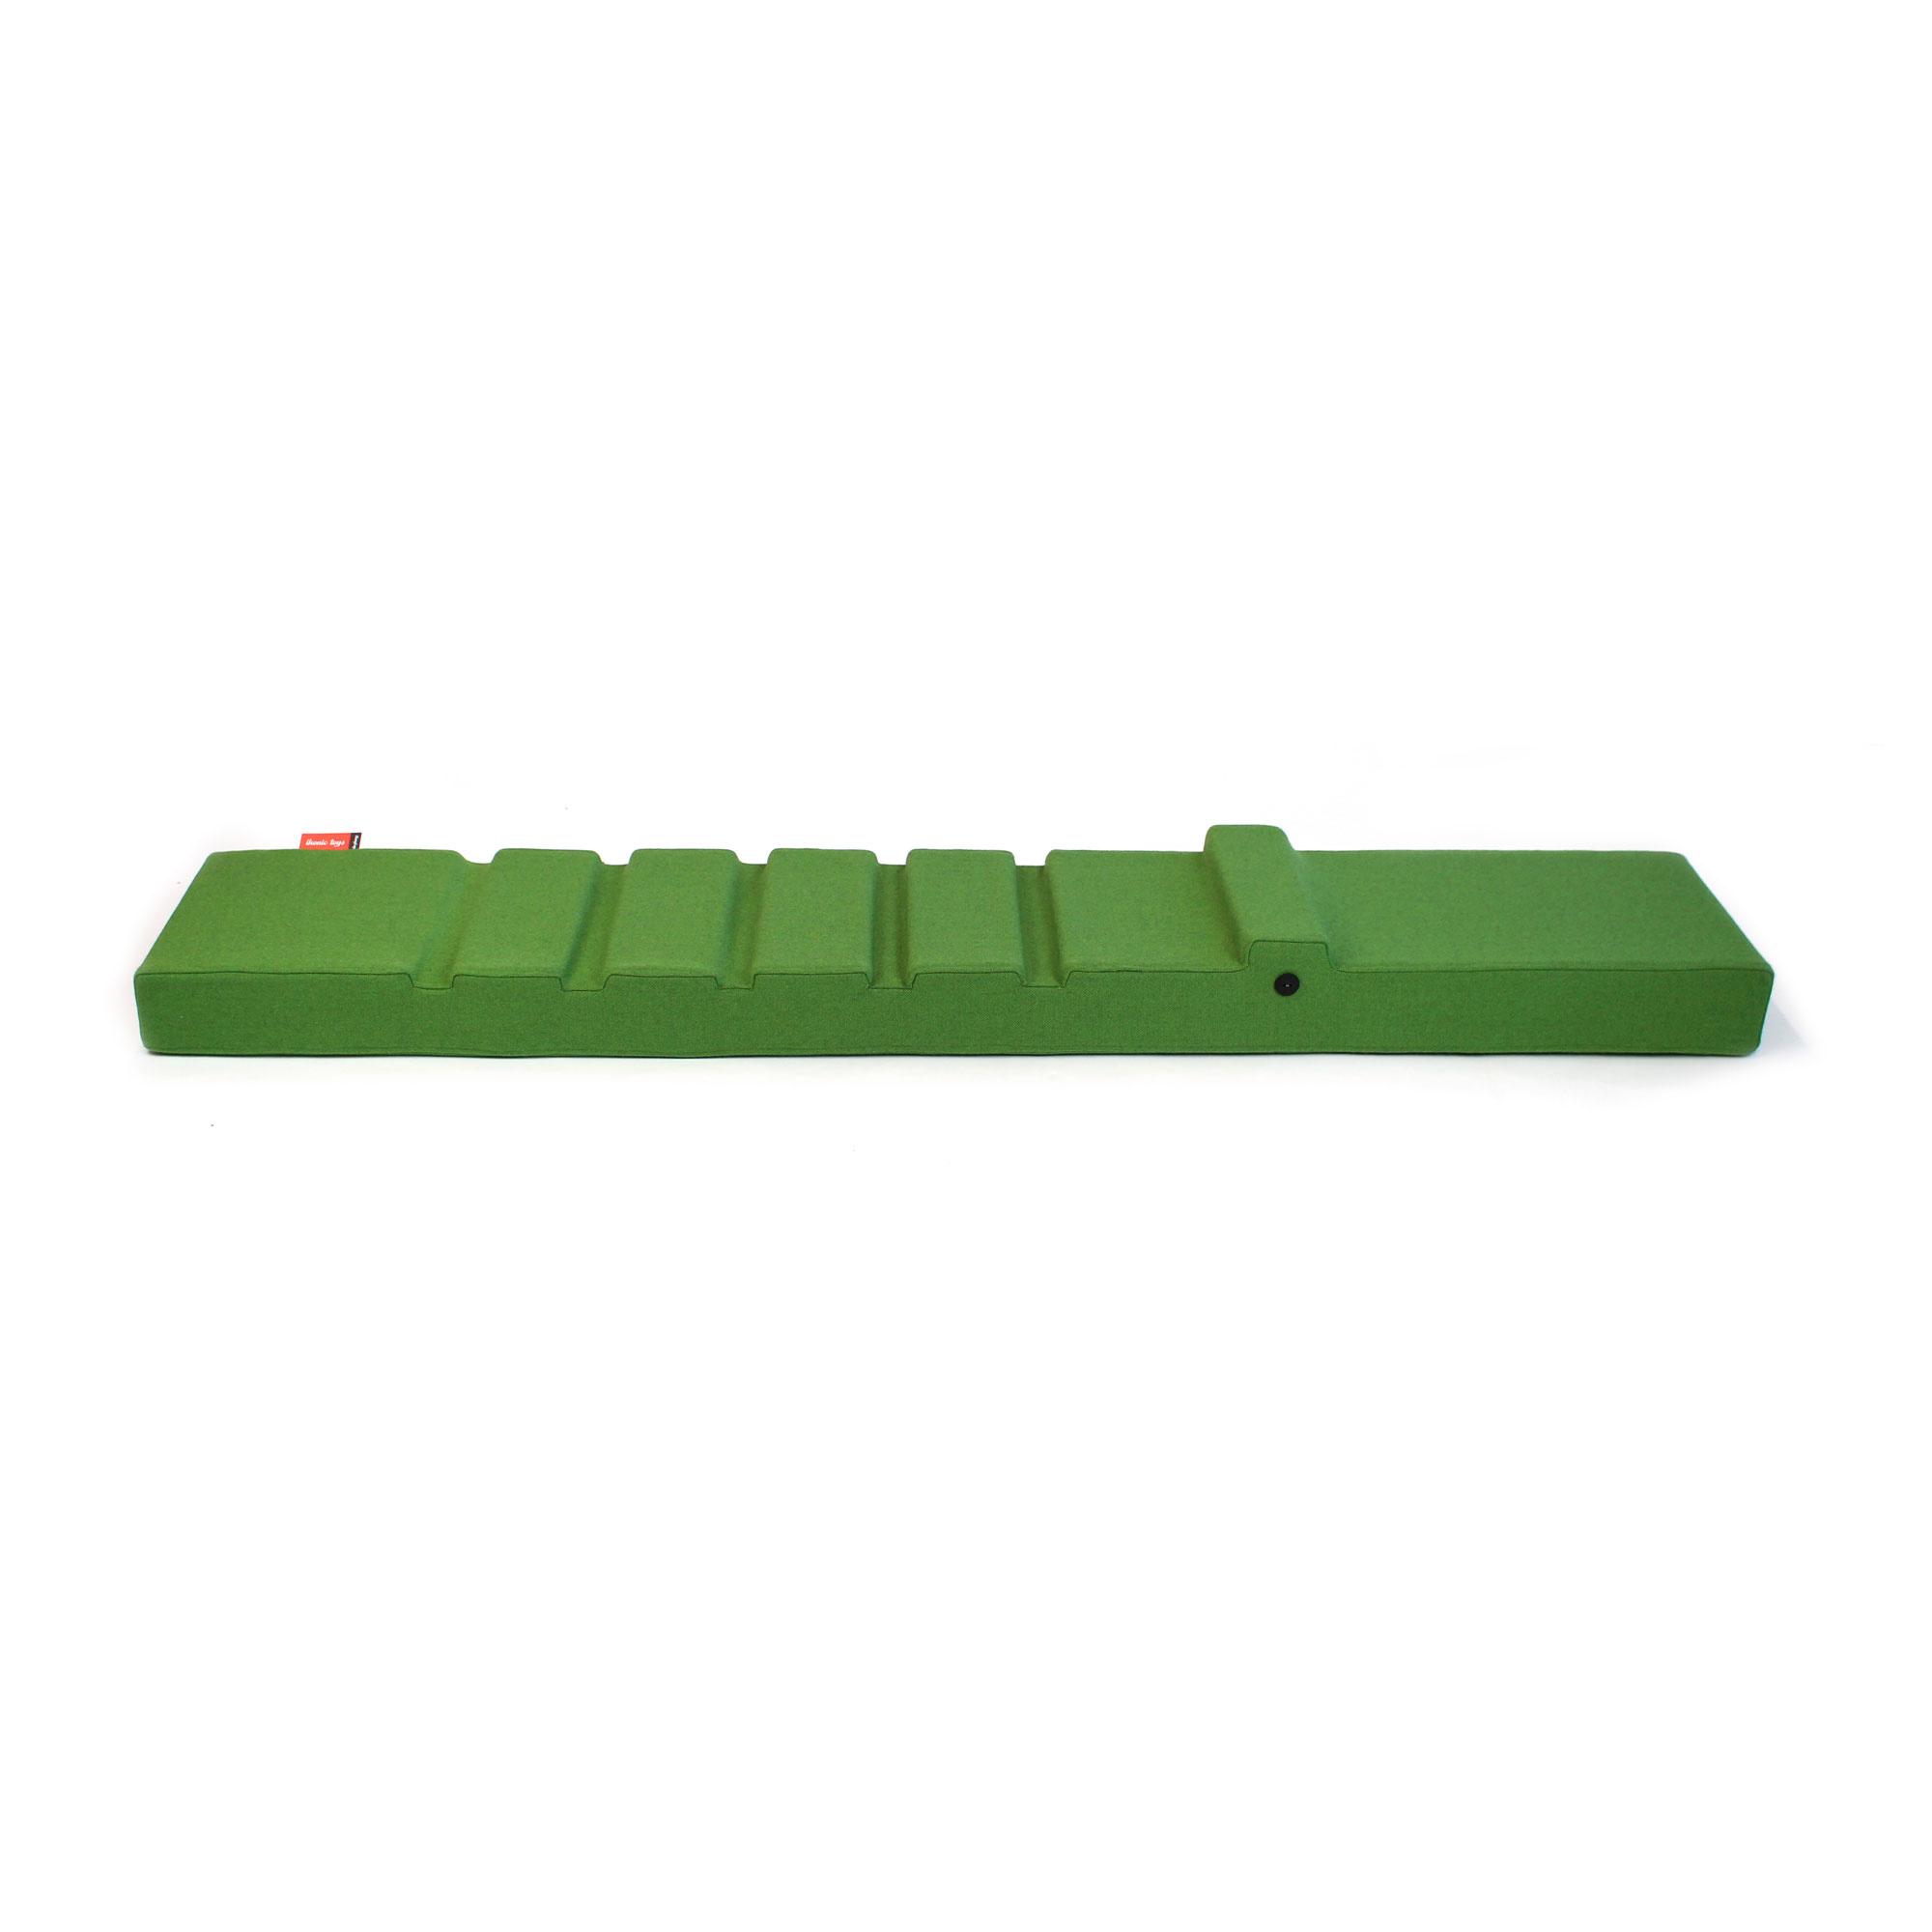 Ikonic Toys Floris Hovers Krokodil XXL - indoor